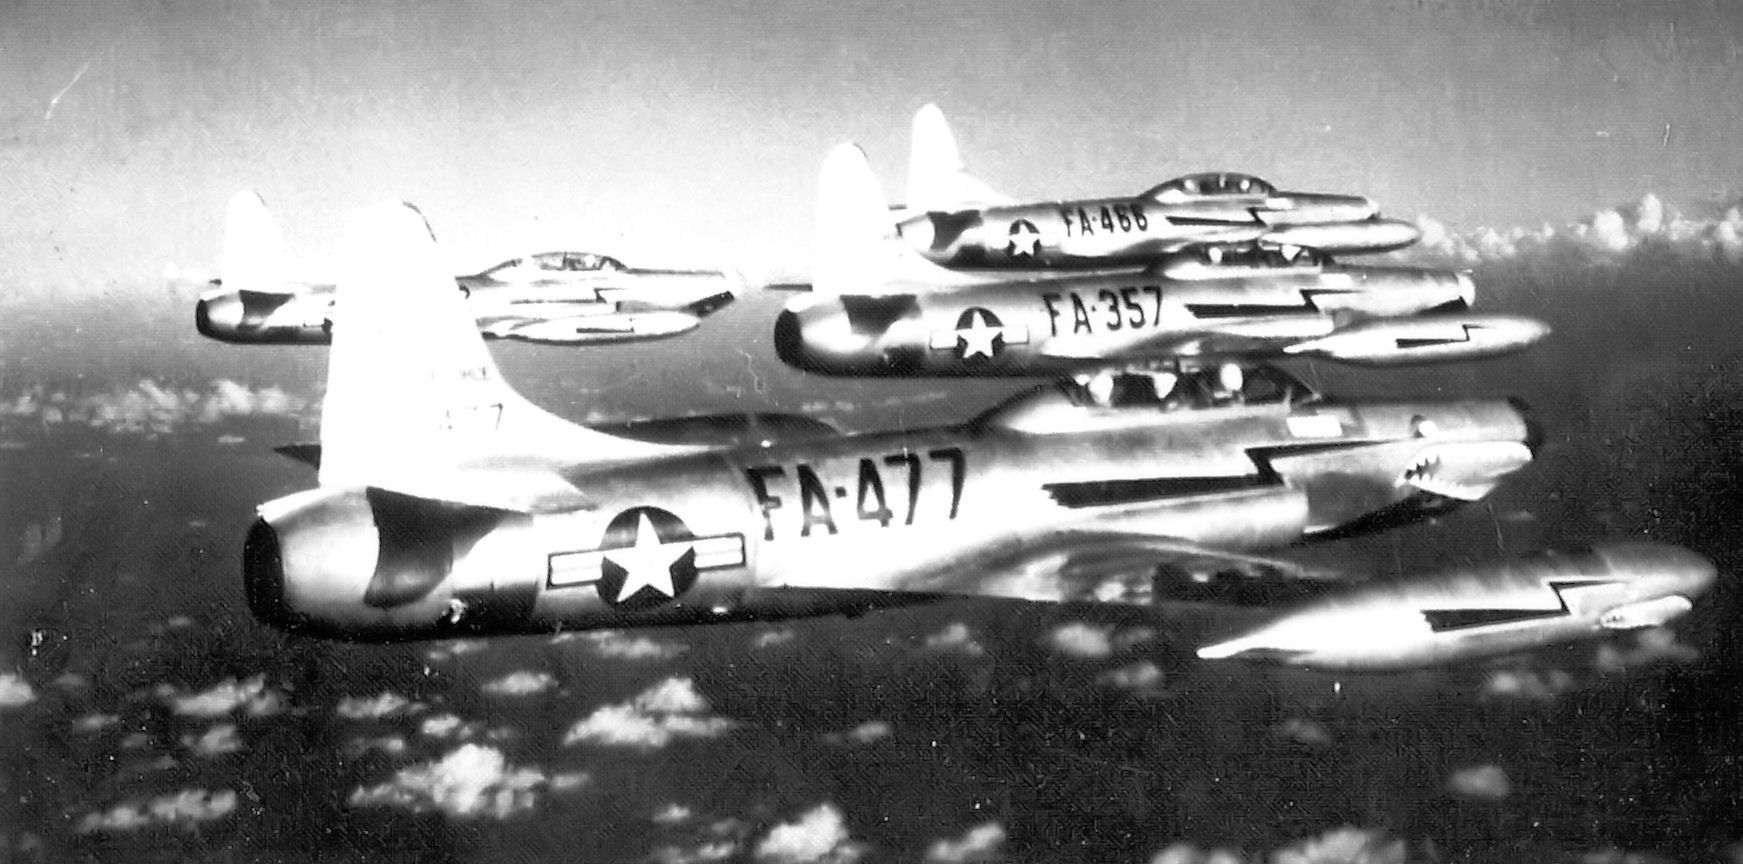 4th FighterInterceptor Squadron Lockheed F94B 4 plane